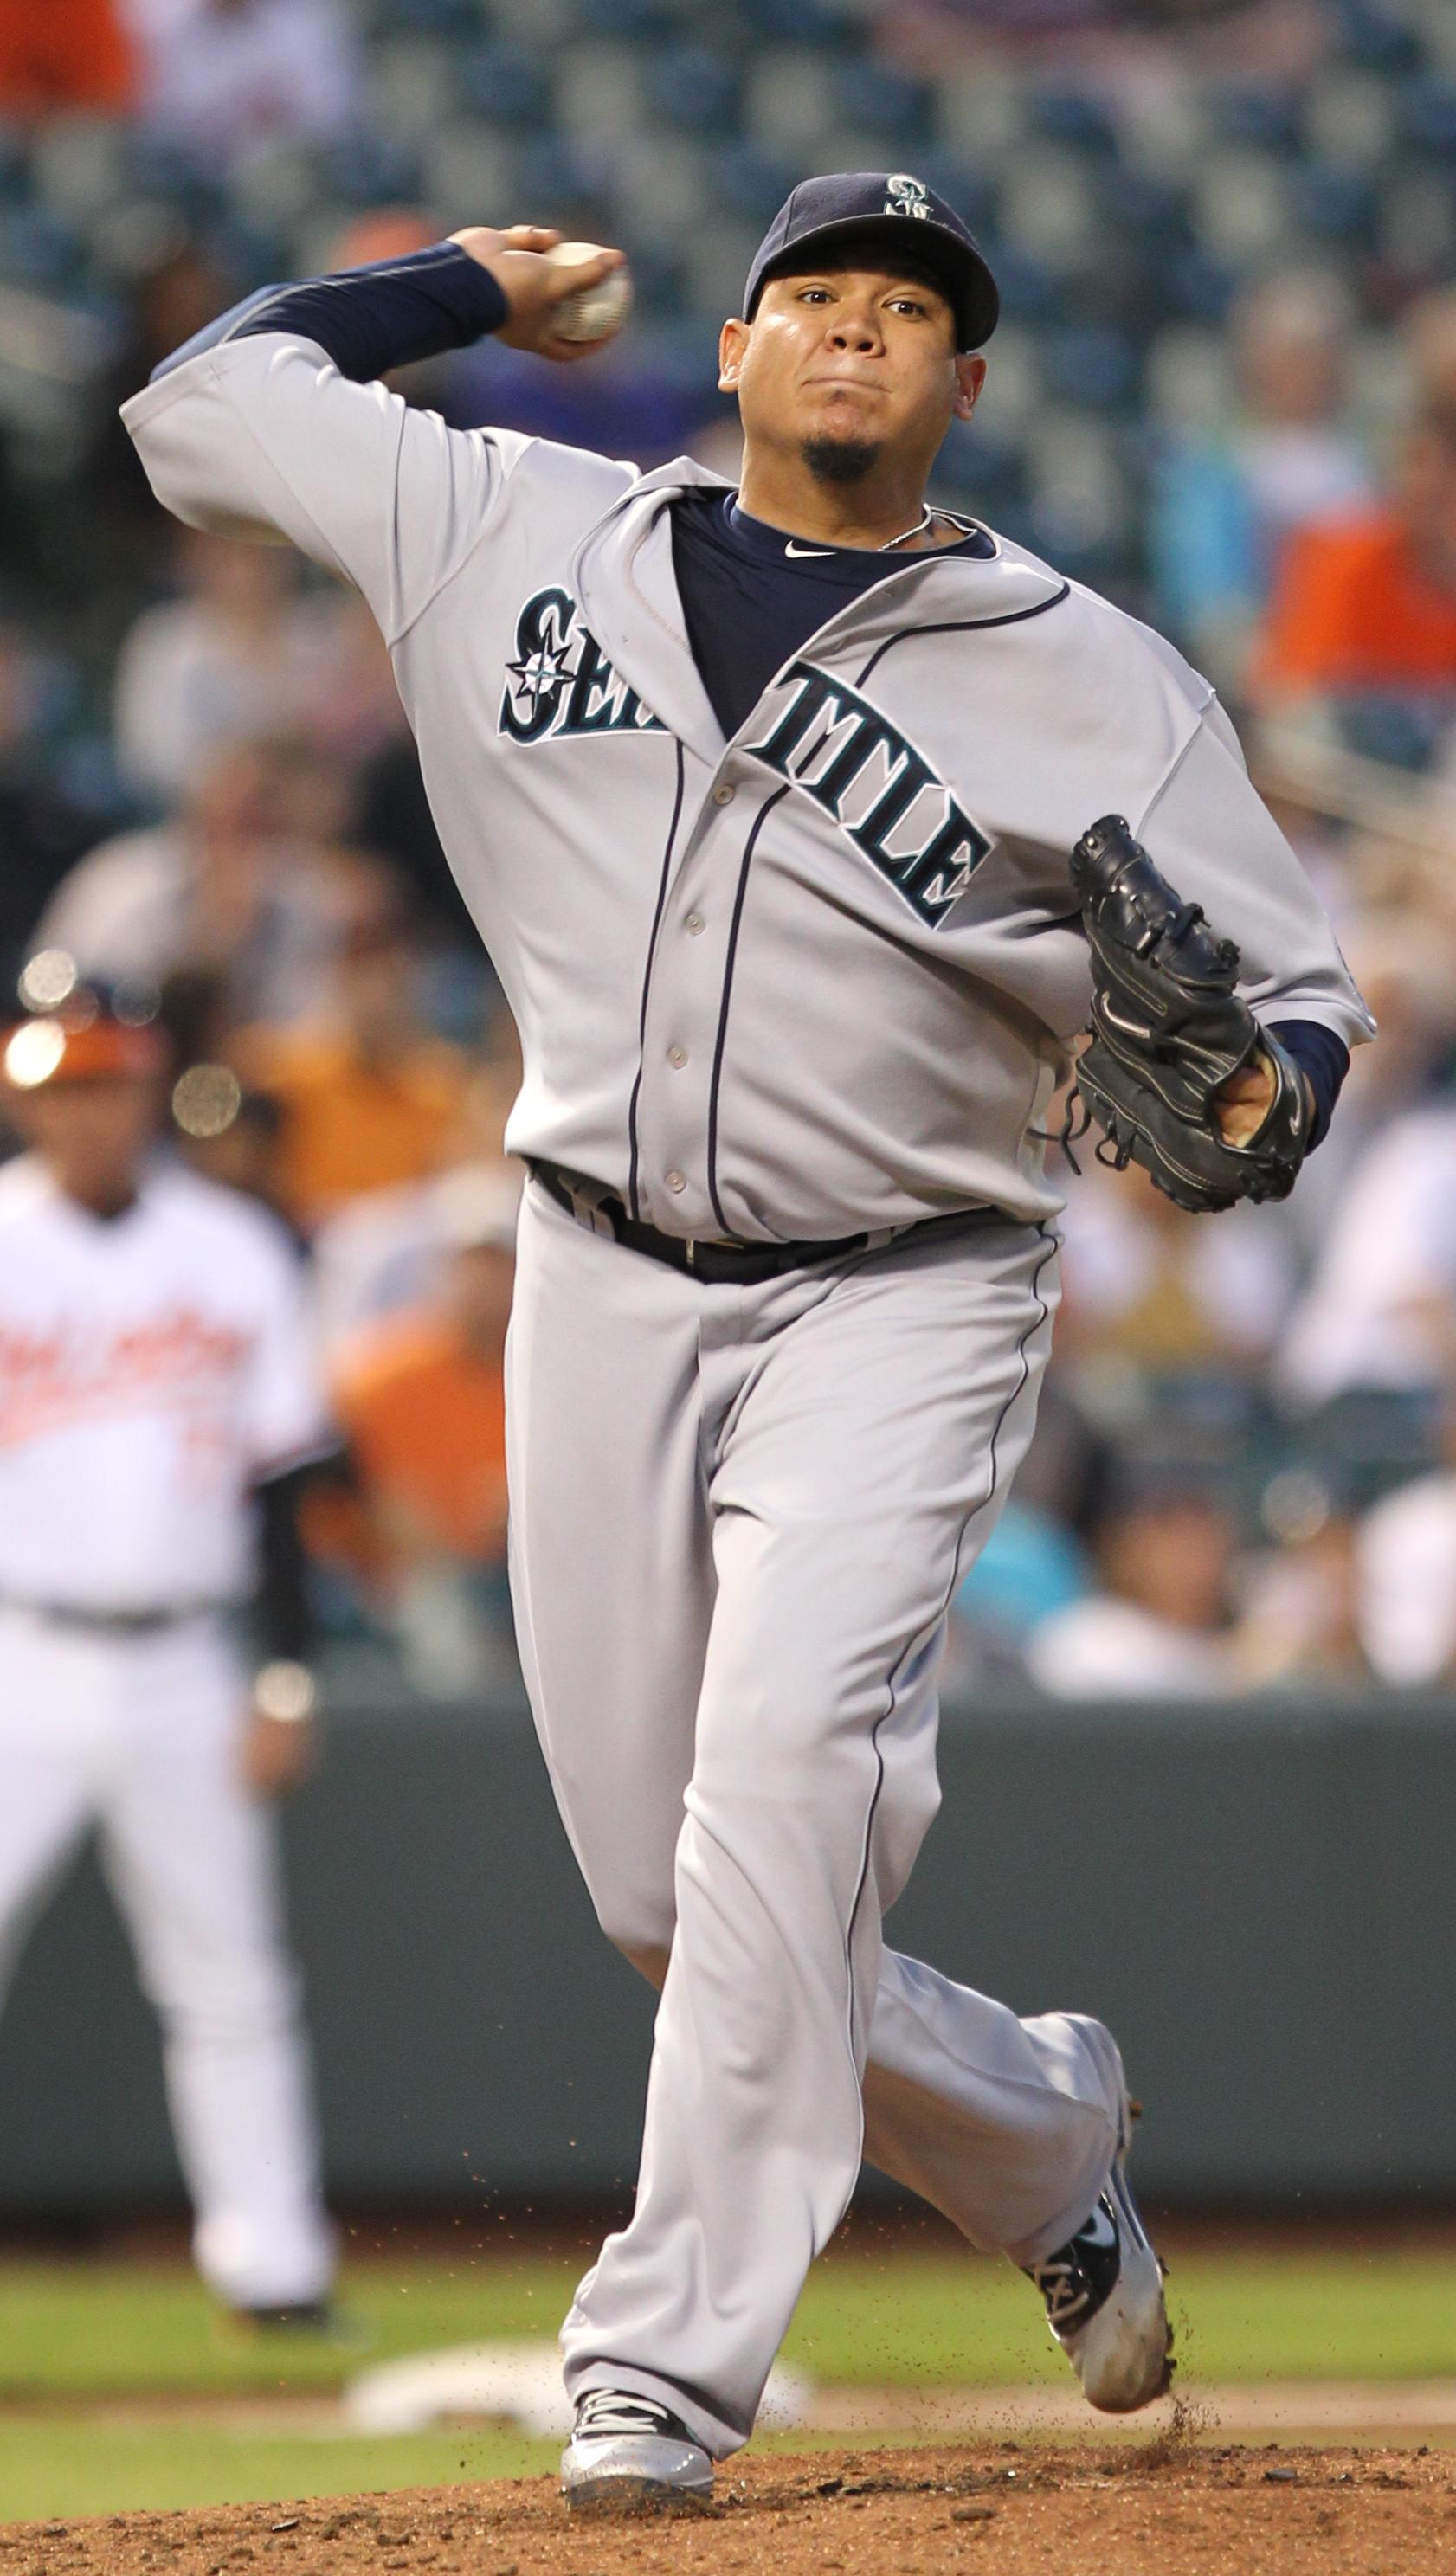 File:Seattle Mariners starting pitcher Felix Hernandez (34) (5712186216).jpg - Wikimedia Commons